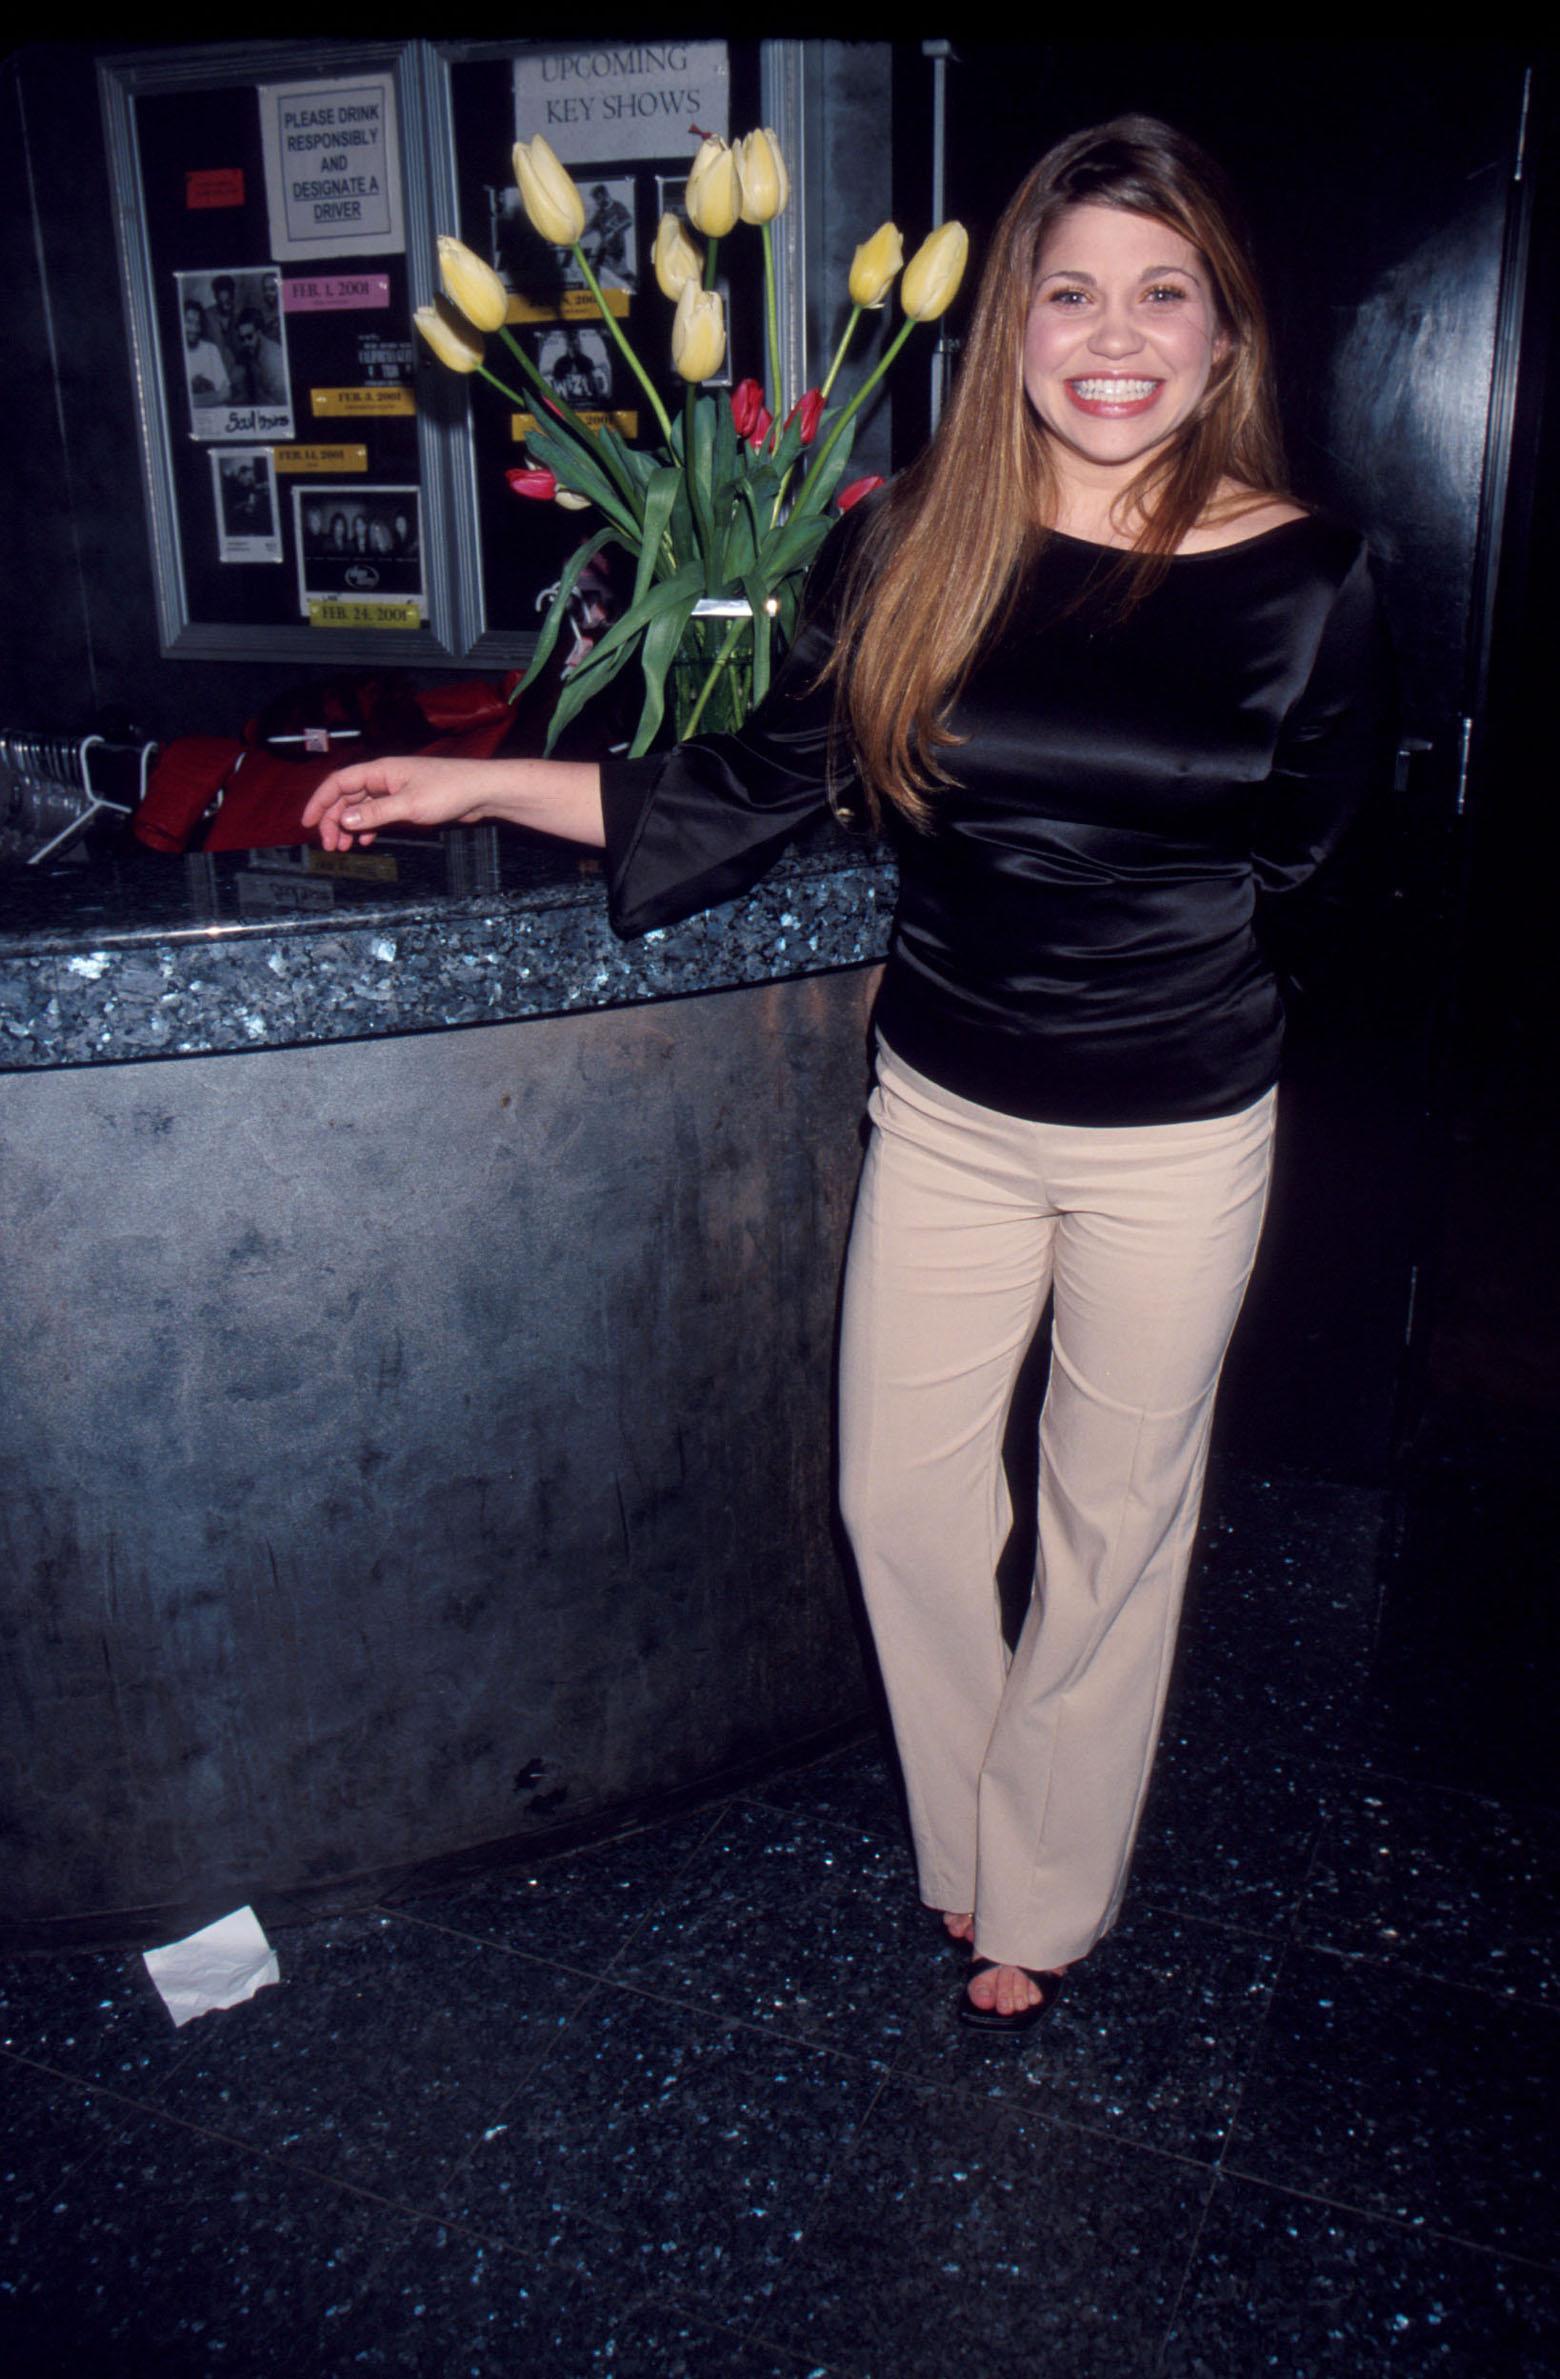 New Celebrity Buzz: Danielle Fishel Feet